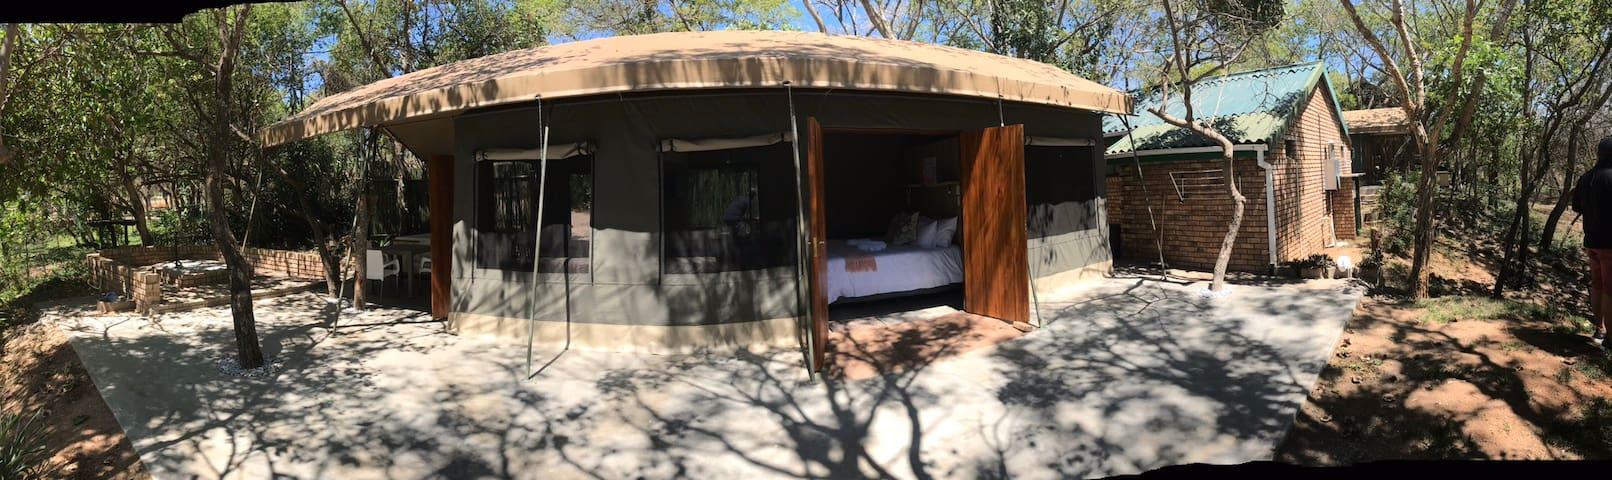 Affordable Luxury Kruger Park accommodation